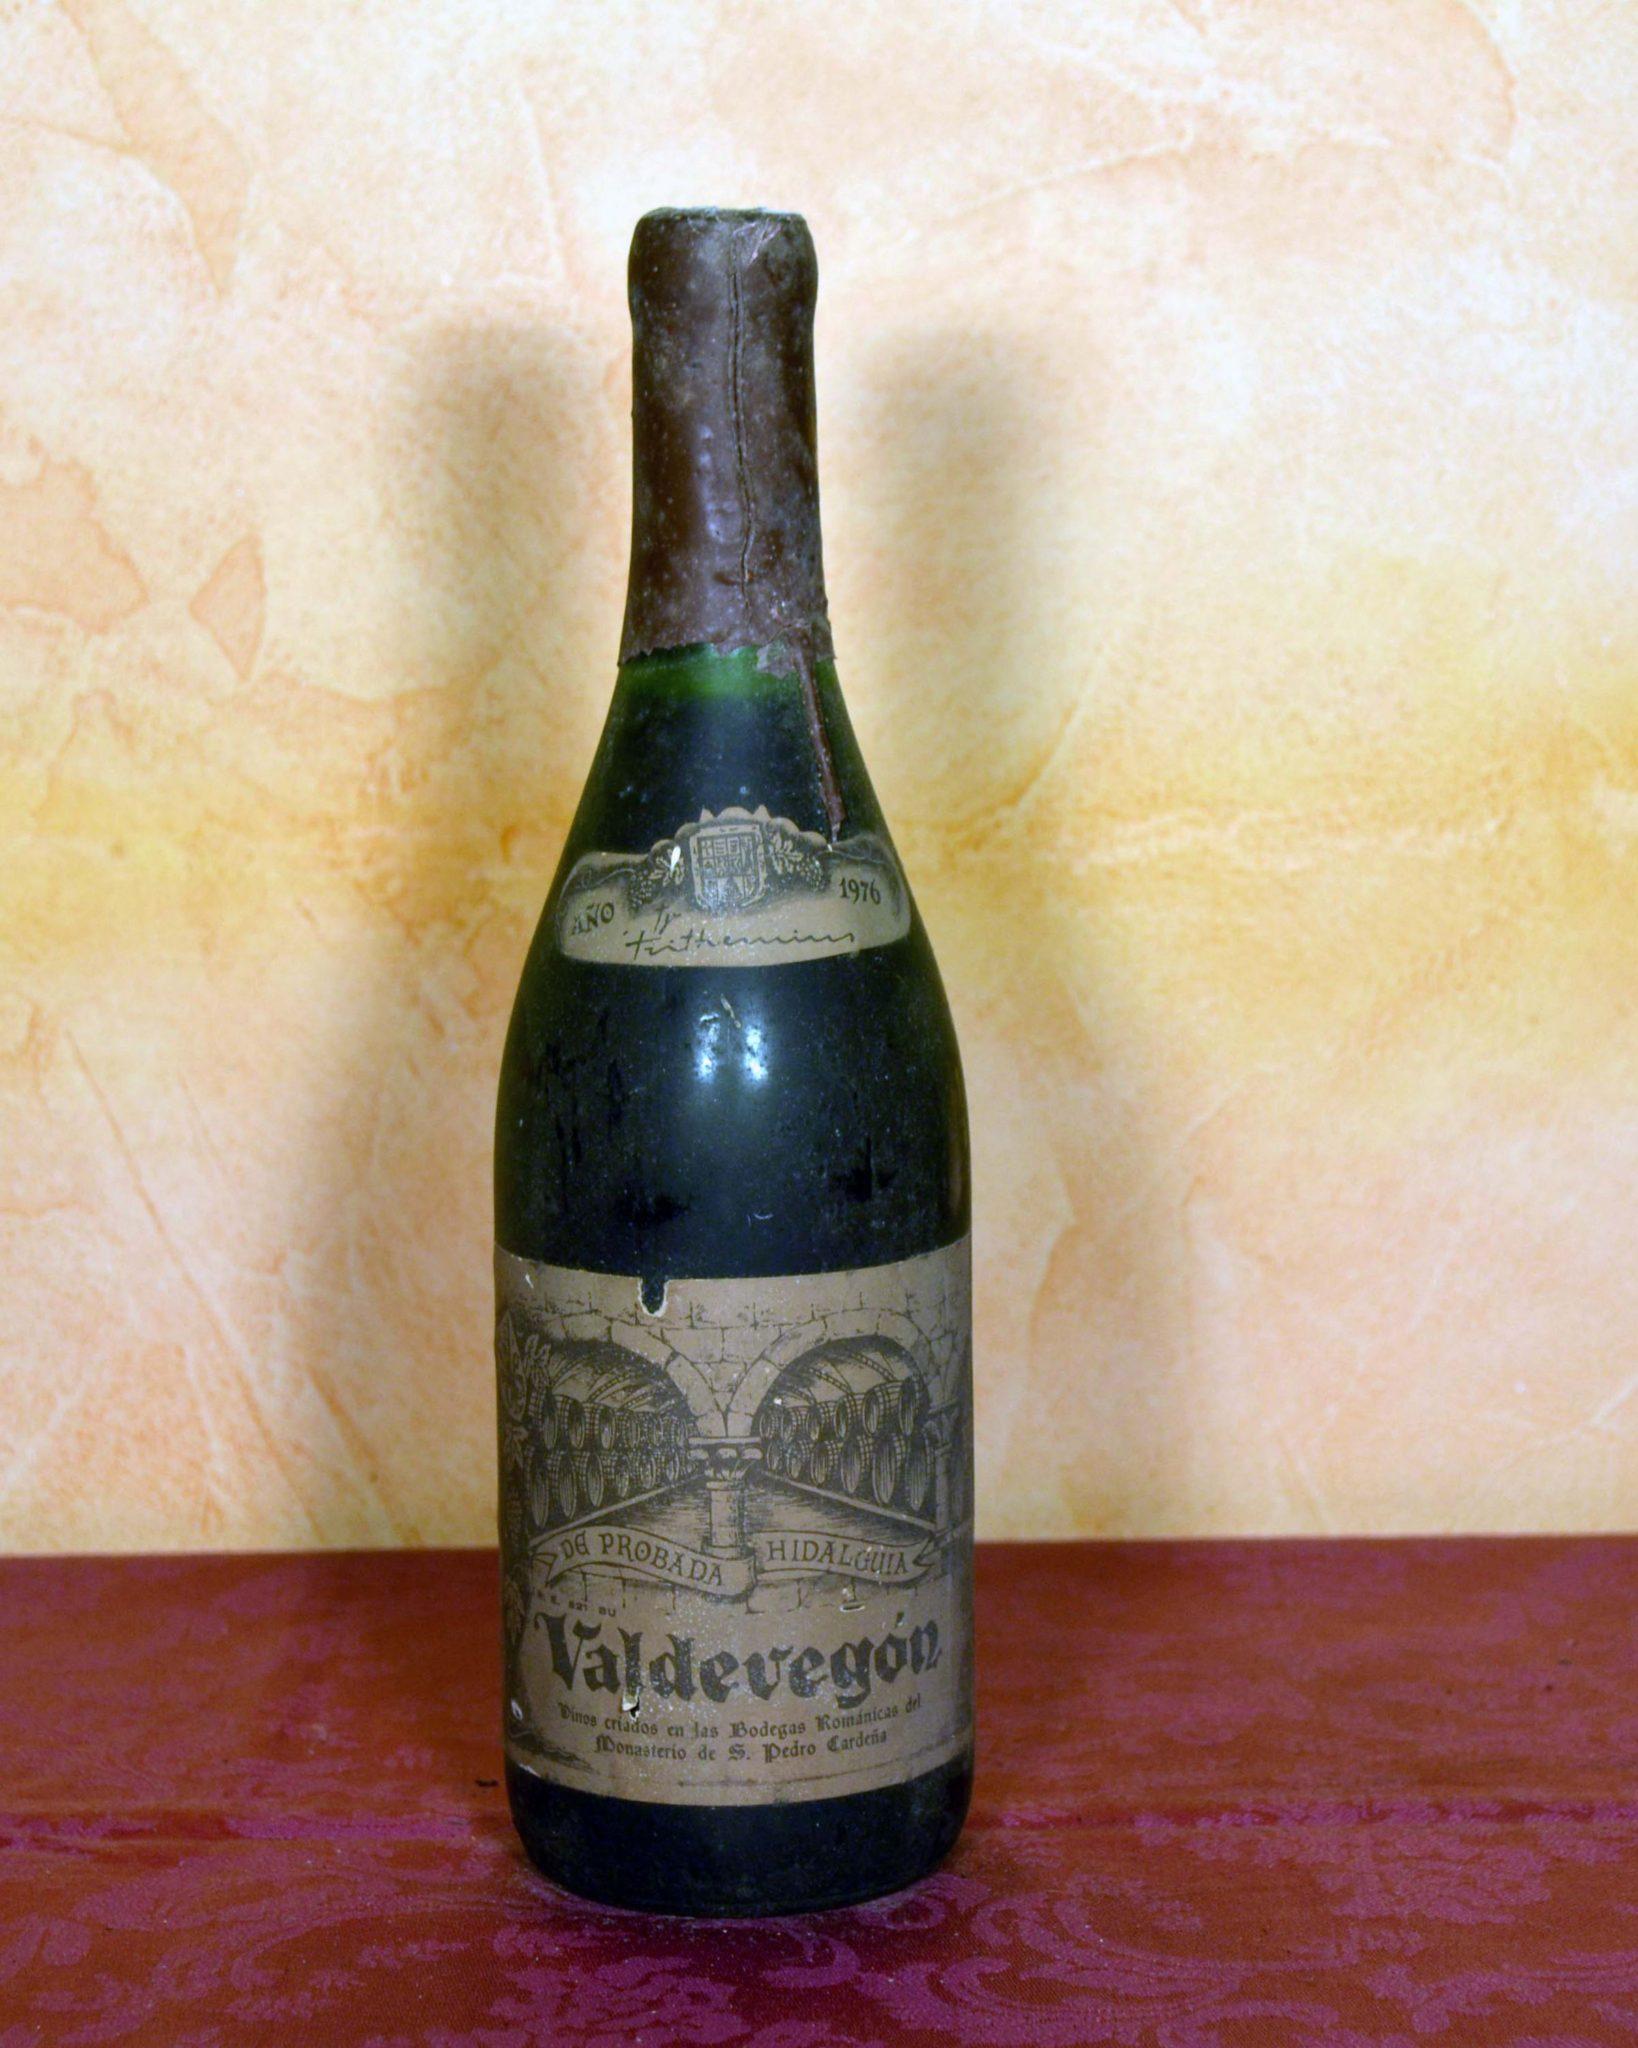 Valdegón Romanicas Vintage 1976